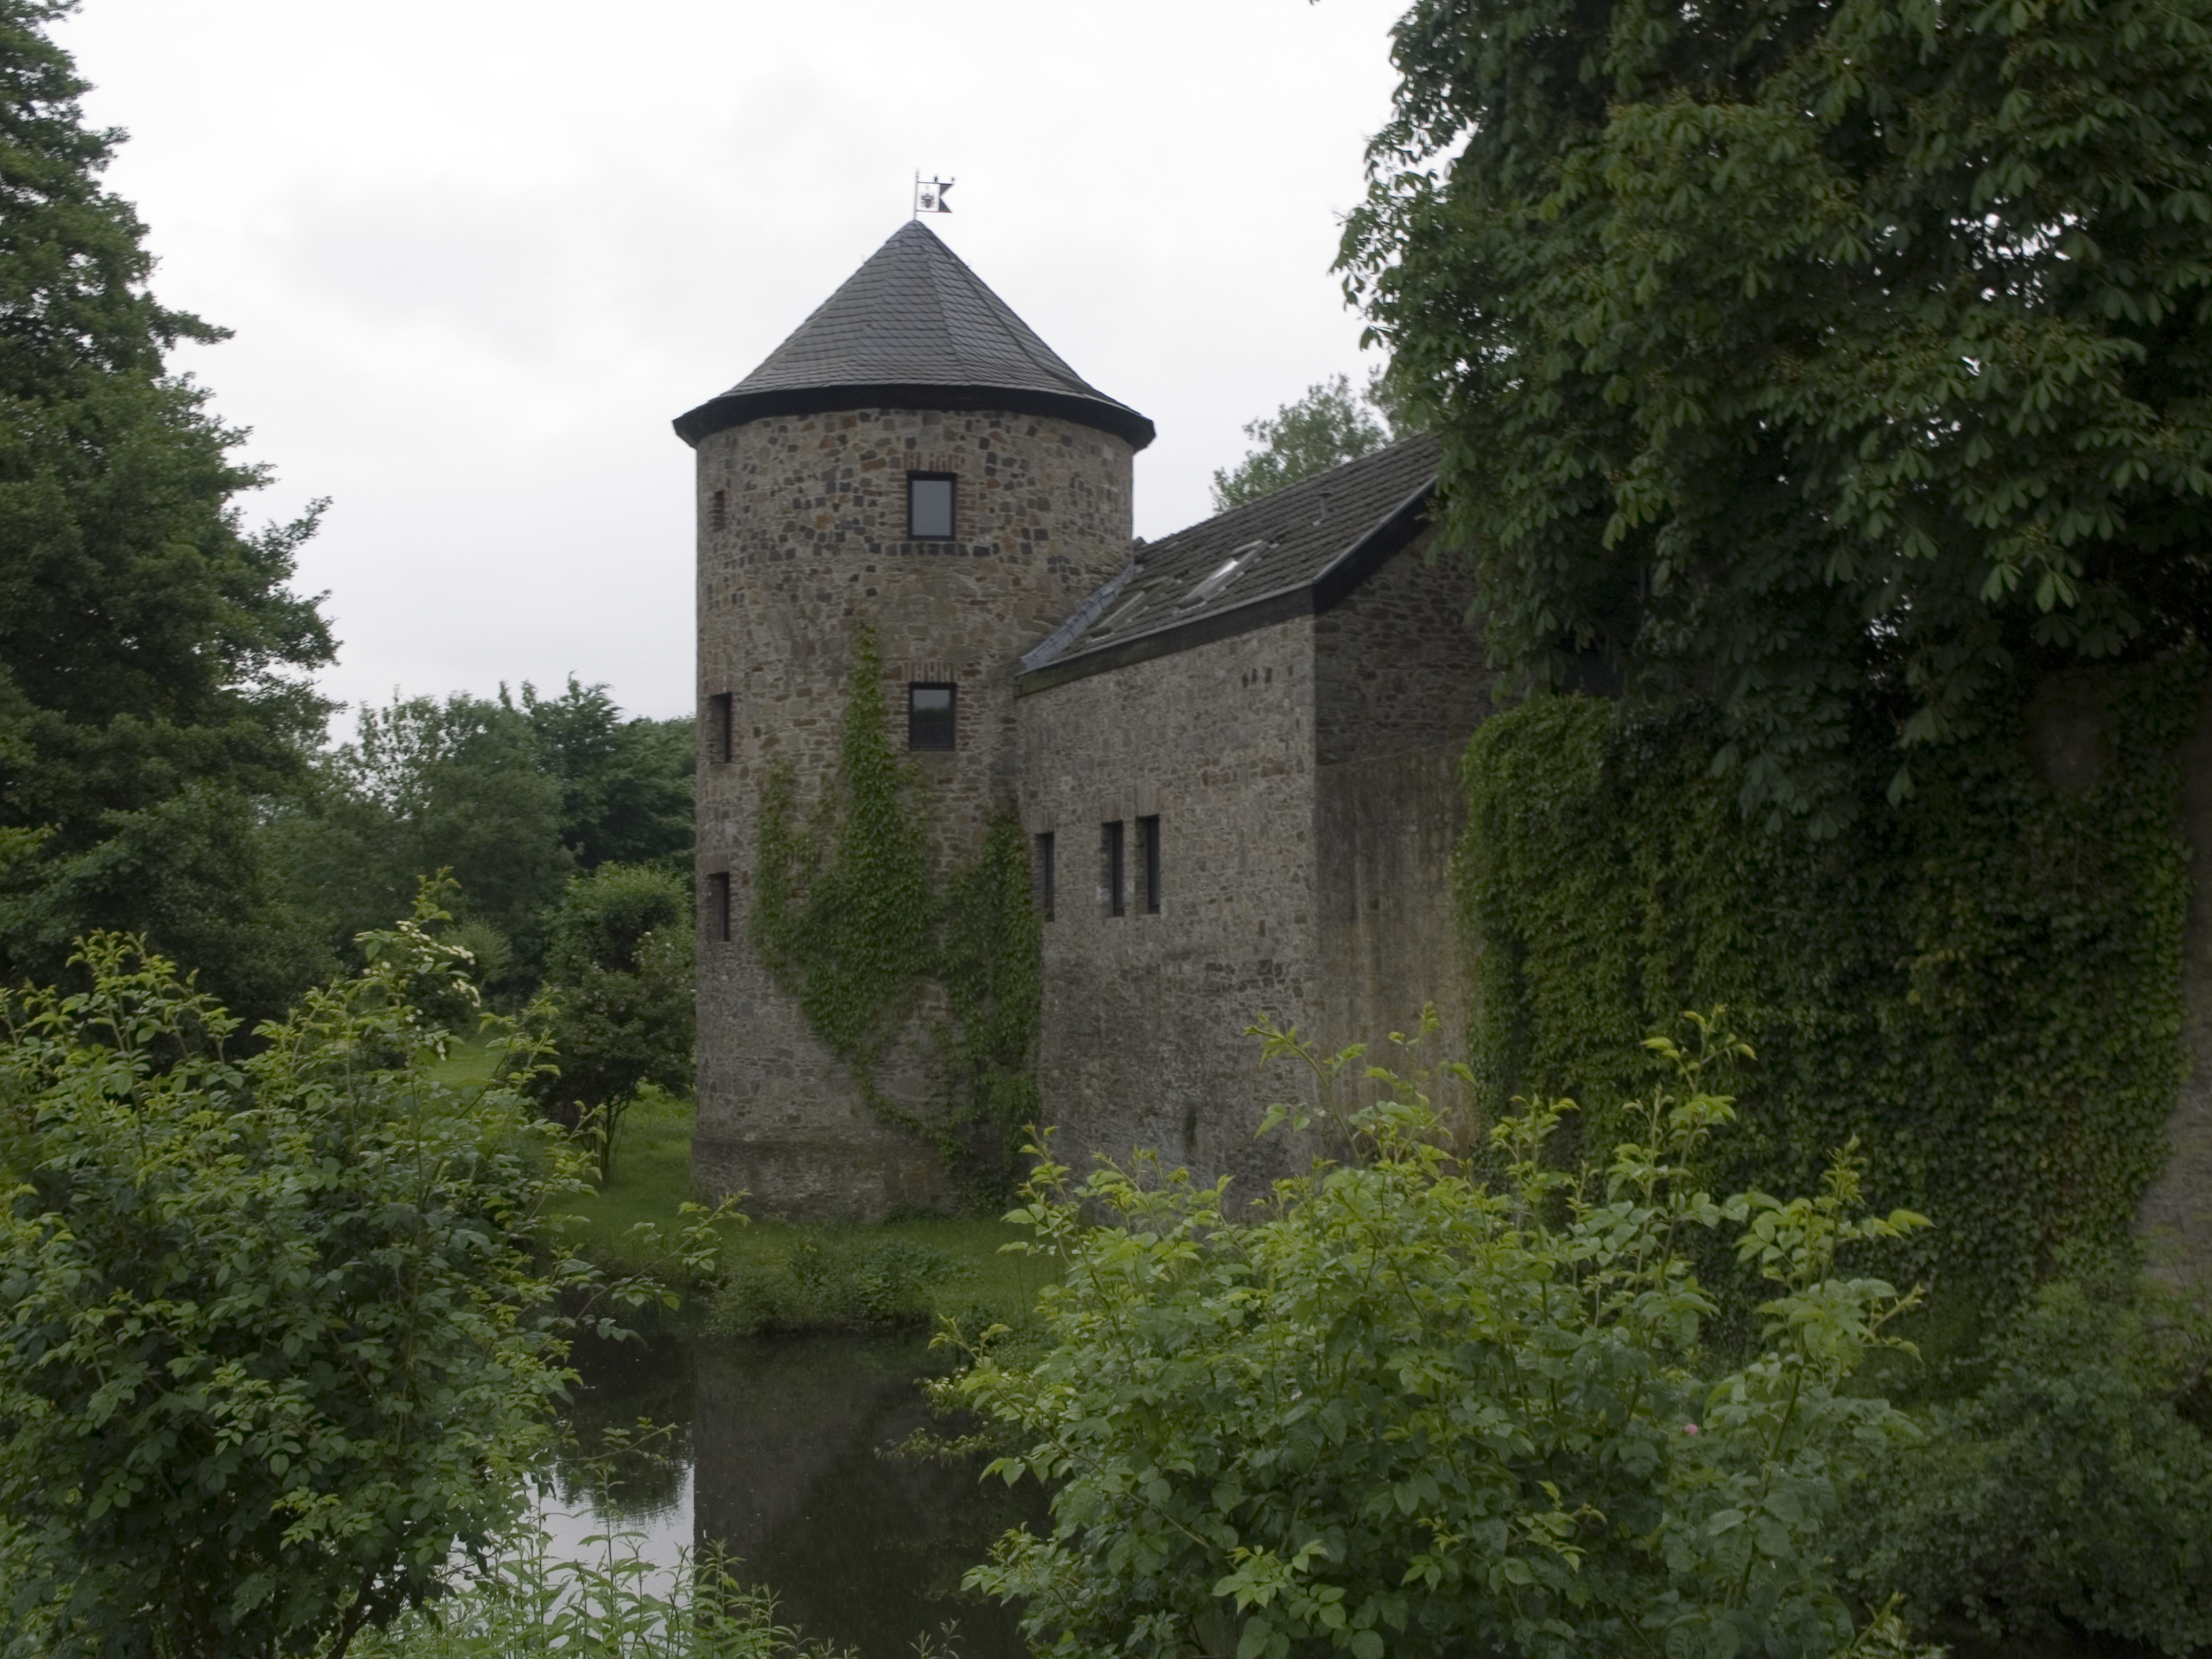 Файл NRW Ratingen Haus zum Haus 03 — Википедия